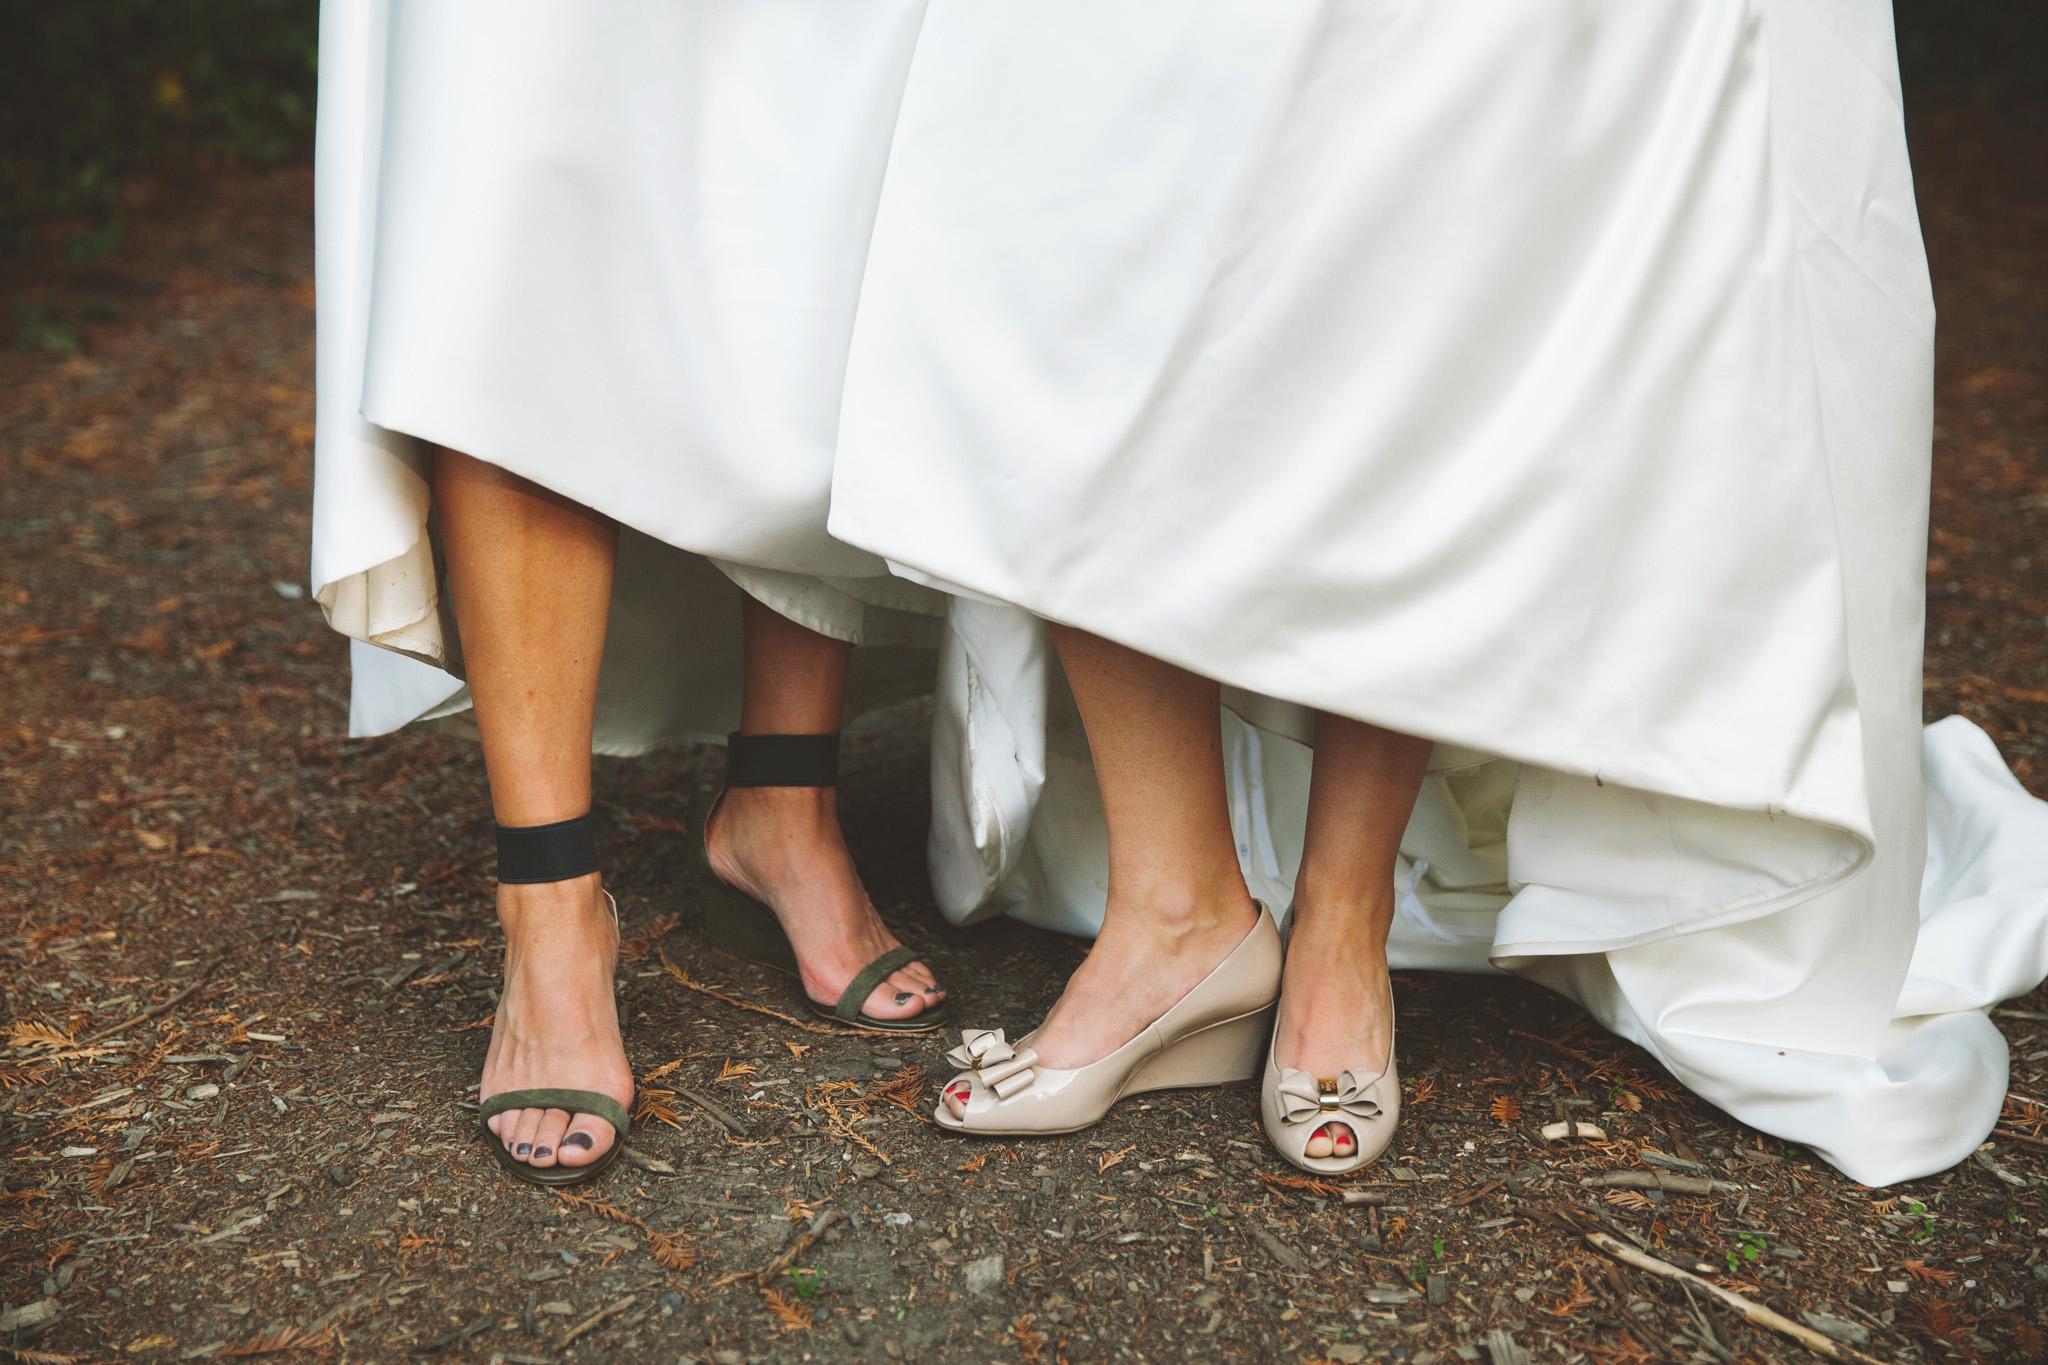 outdoor wedding Reception in the Redwoods at Dawn Ranch Guernevill wedding venue.